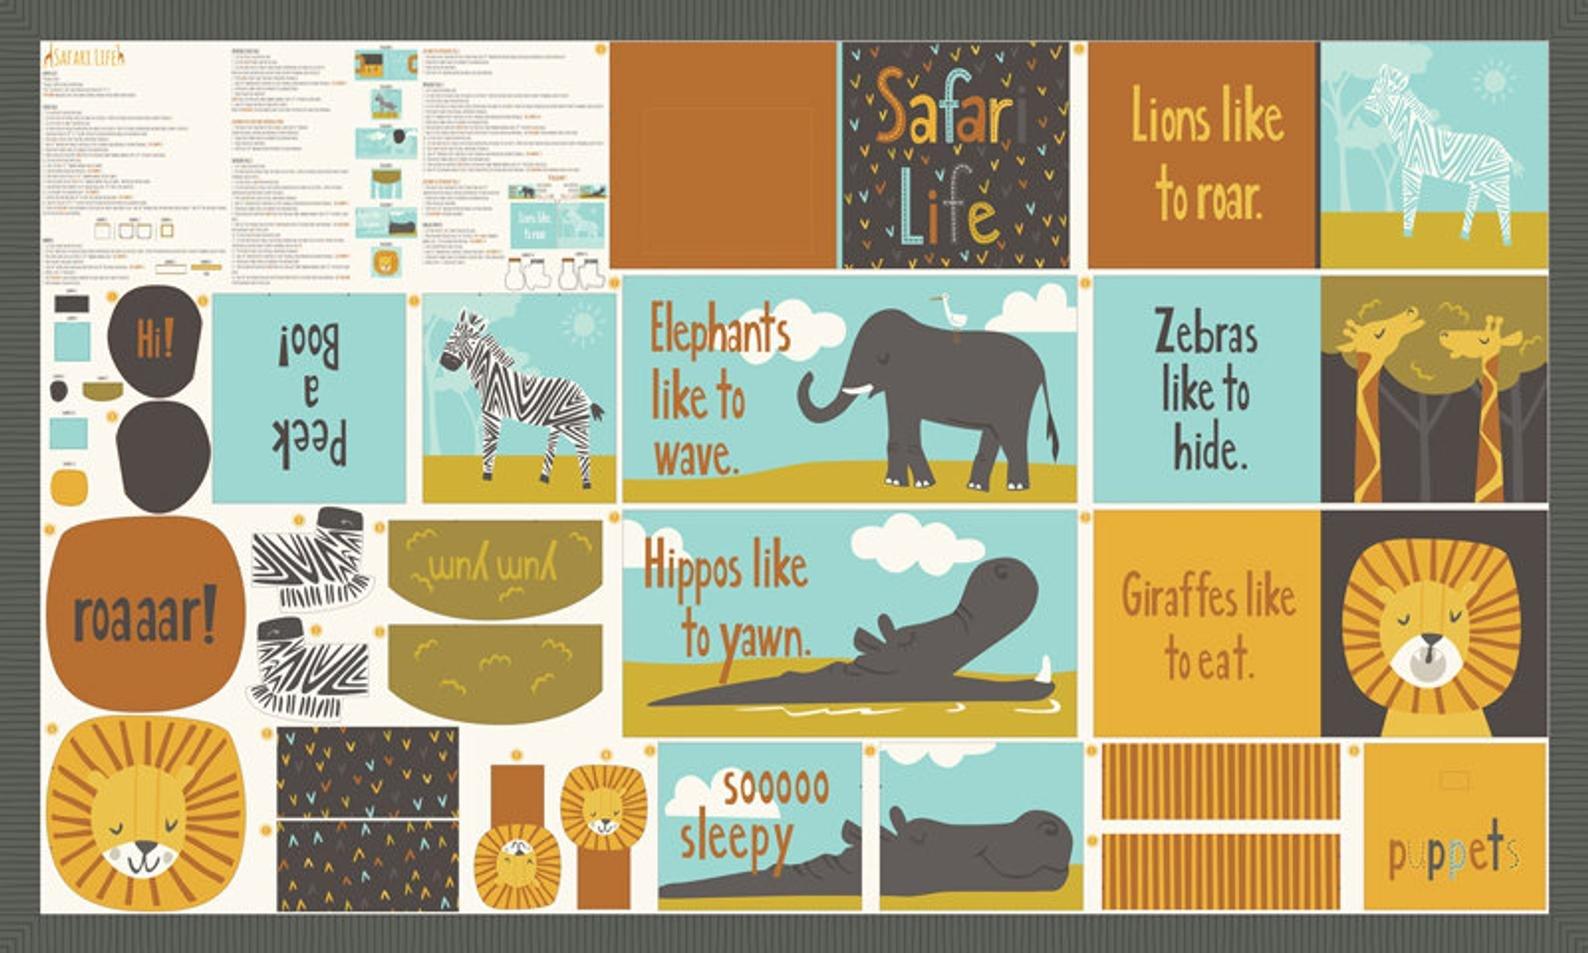 Safari Life Book Panel